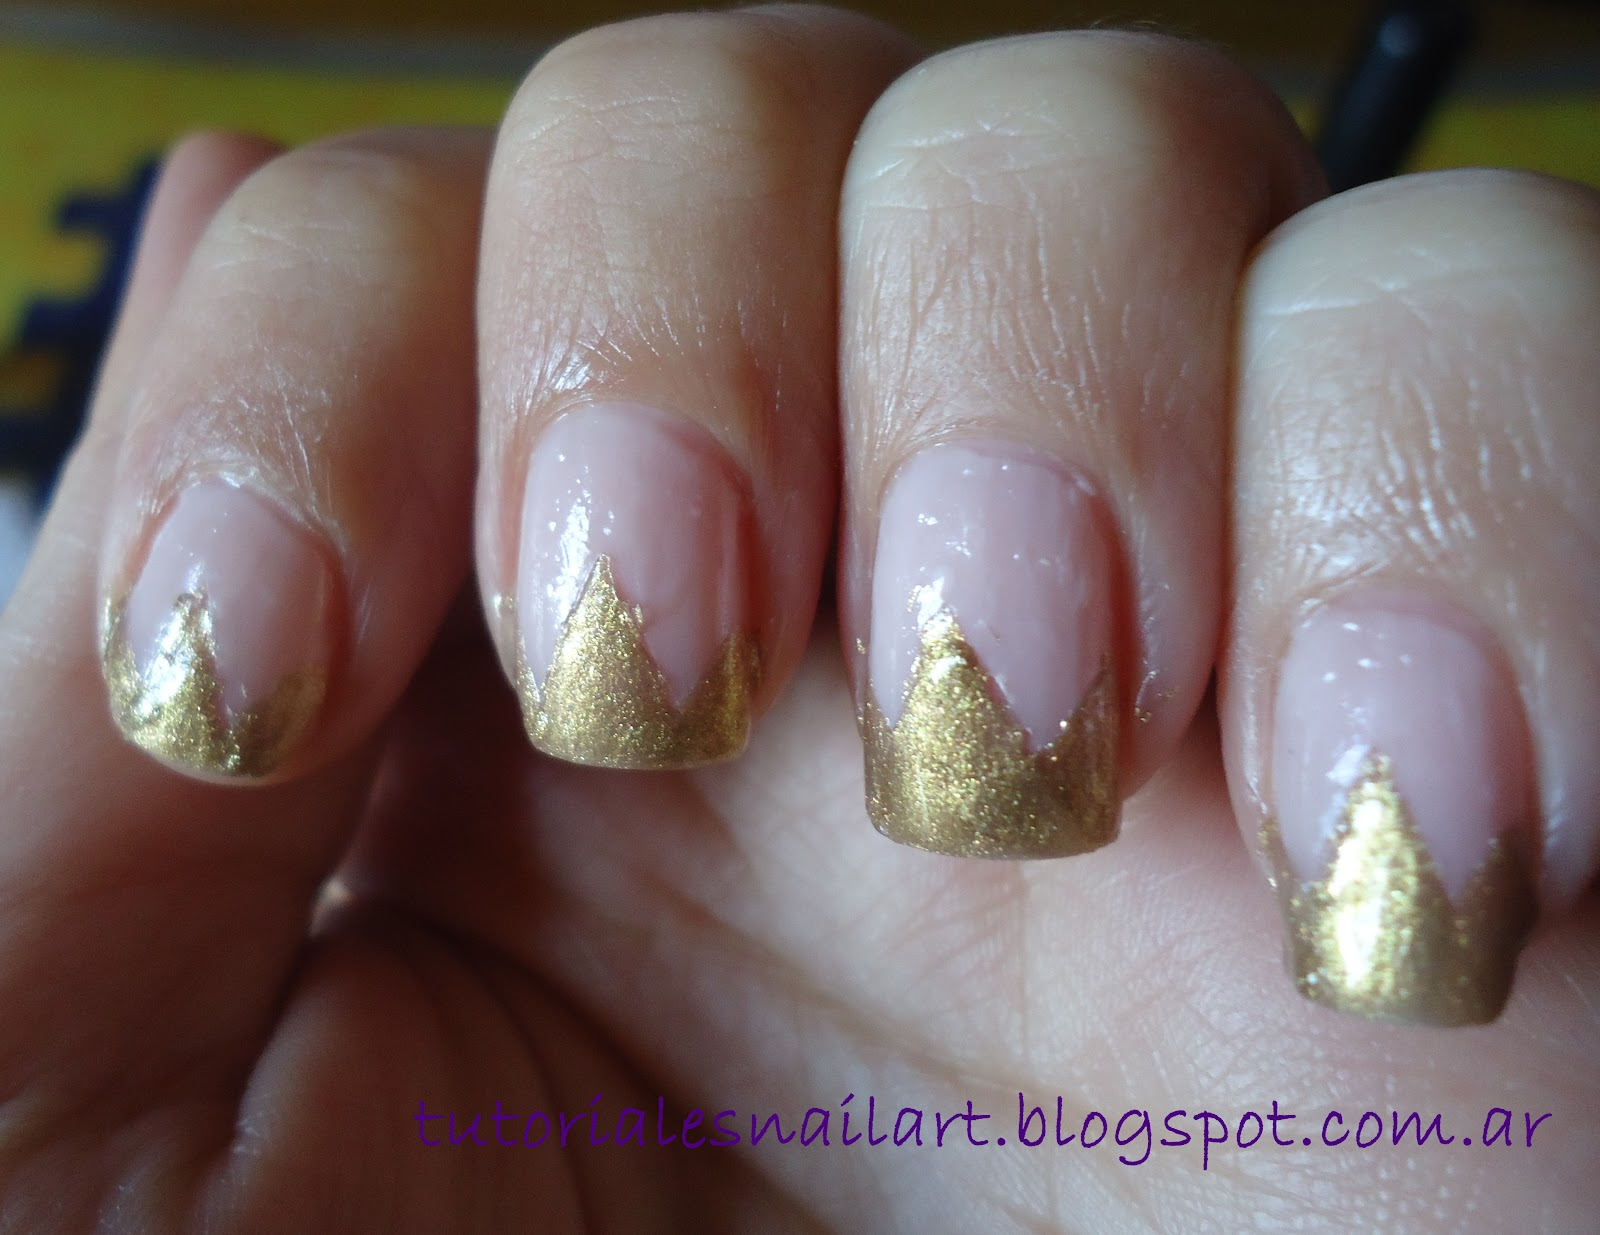 Tutoriales Nail Art: Uñas Corona